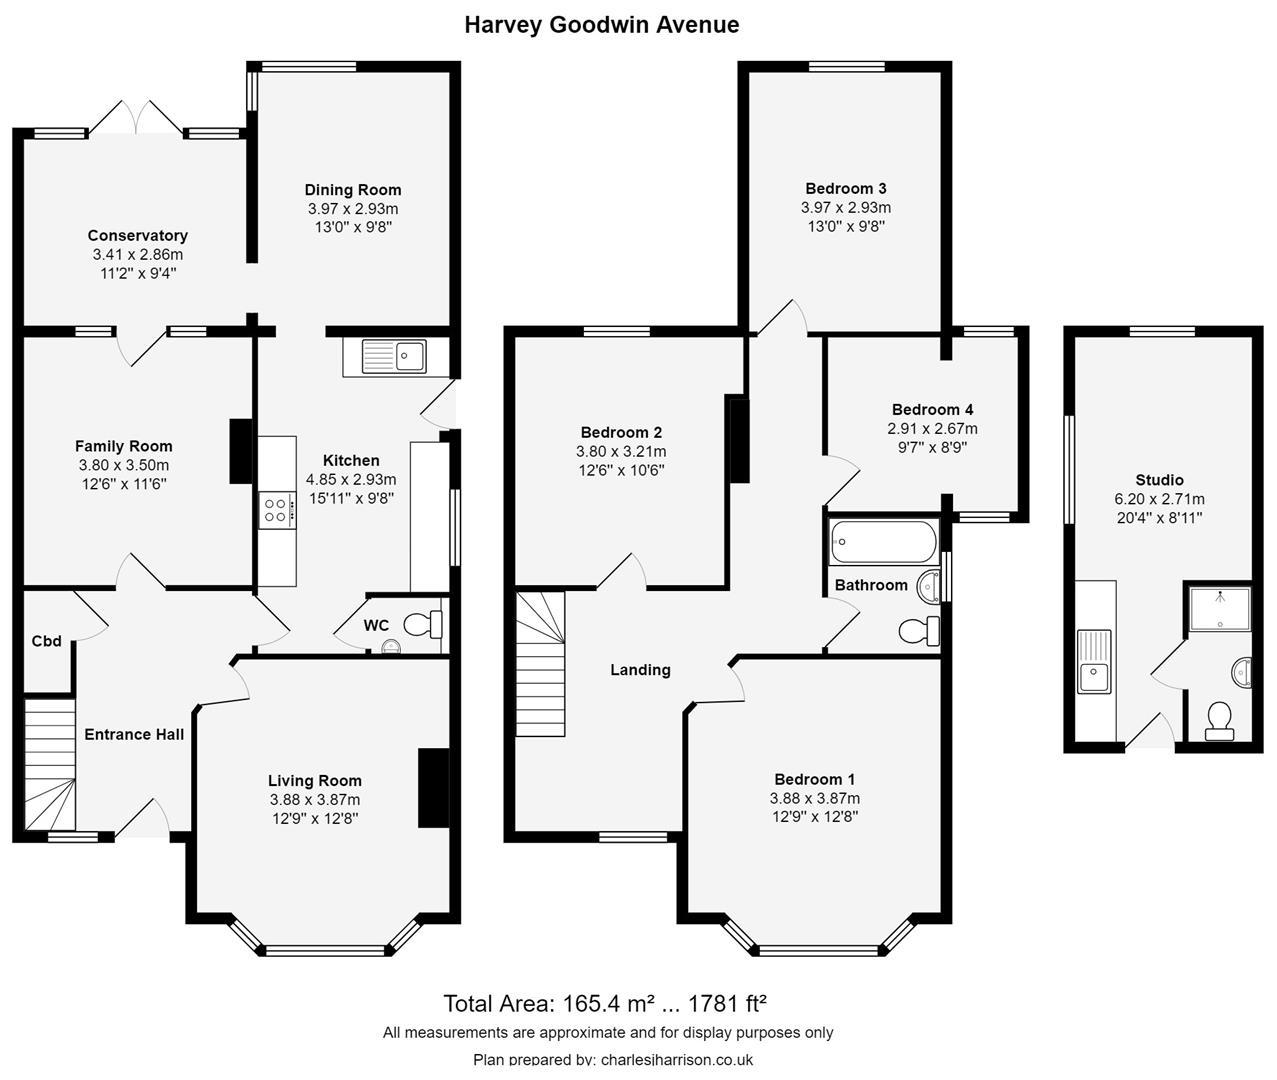 Floor plan Harvey Goodwin Avenue, Cambridge